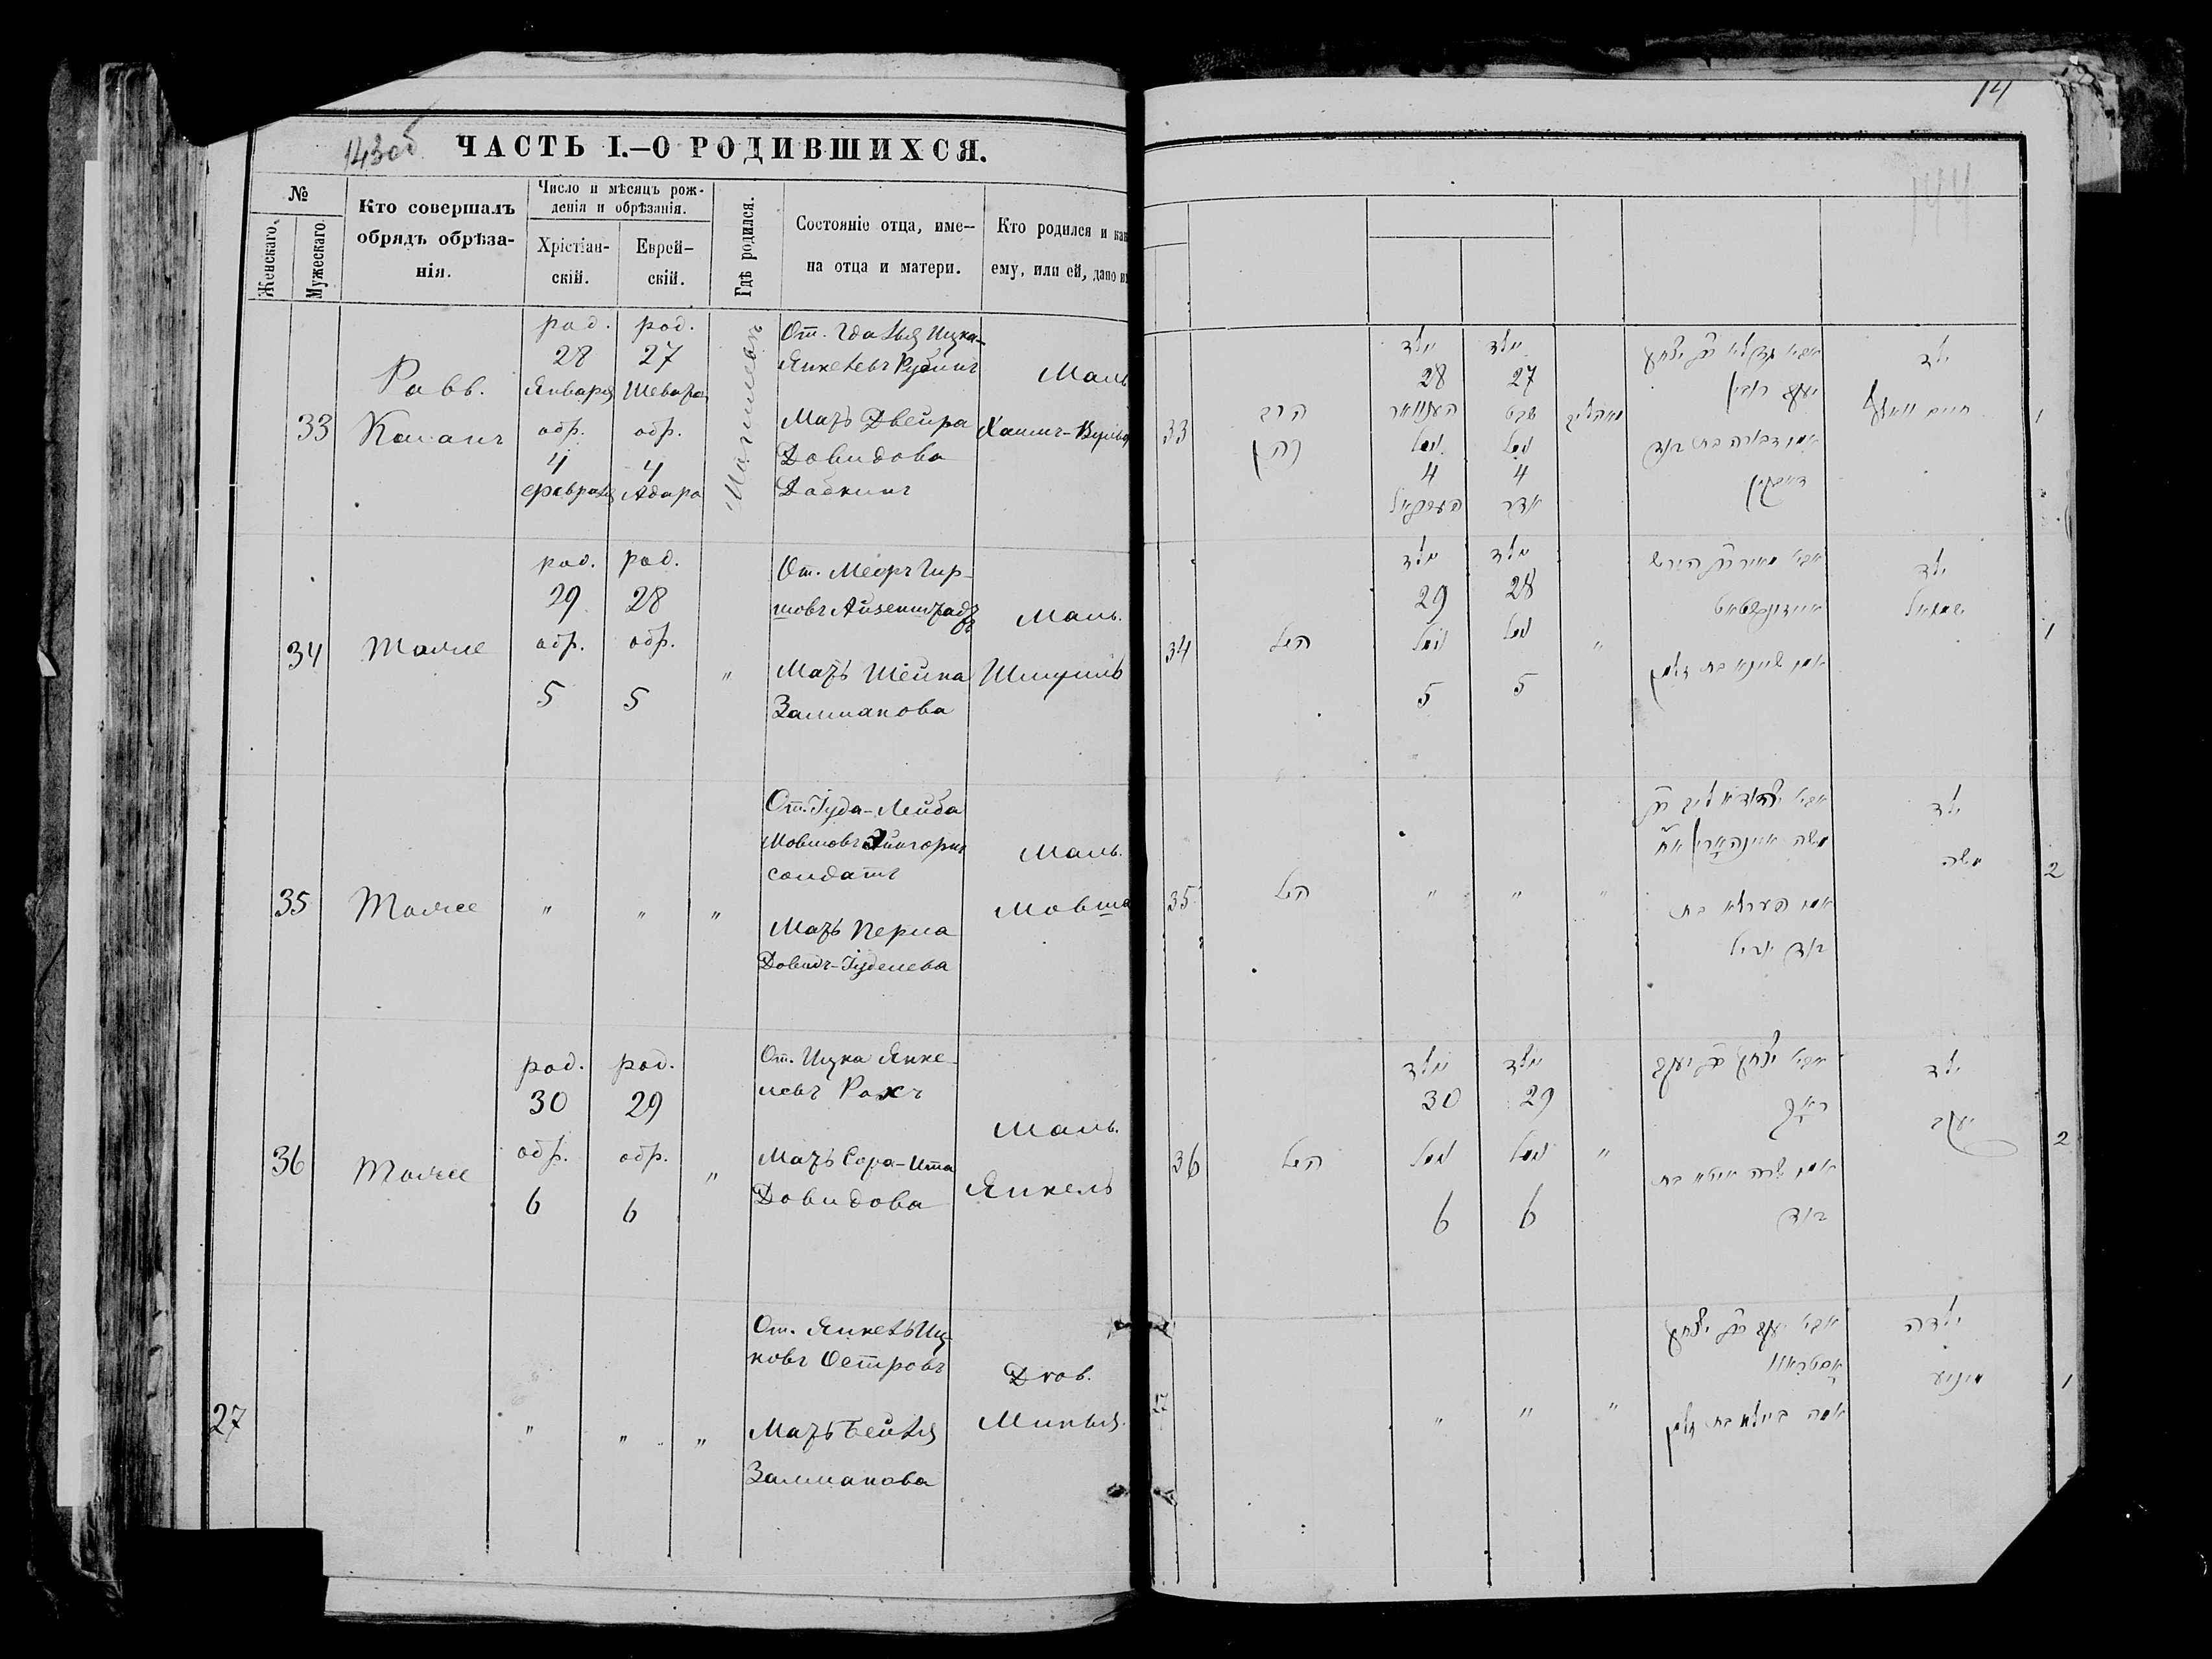 Минья Острова 6 февраля 1880, запись 27, пленка 006677481, снимок 1030